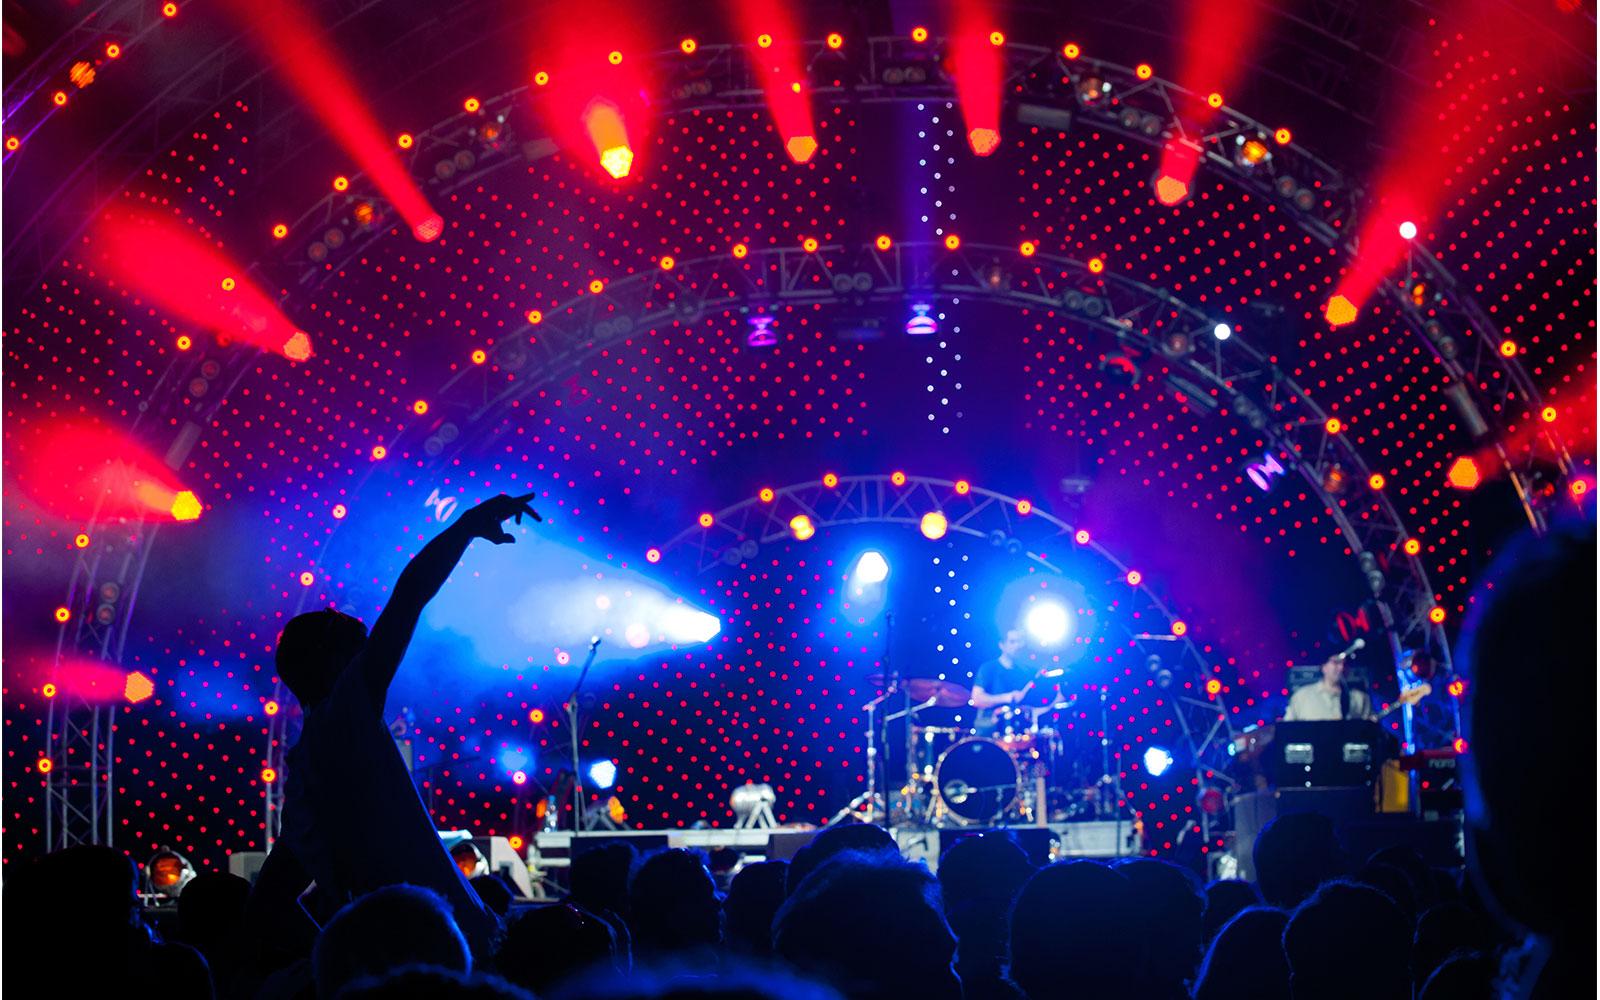 House of Blues Anaheim: Live Concerts, Restaurant & Nightclub